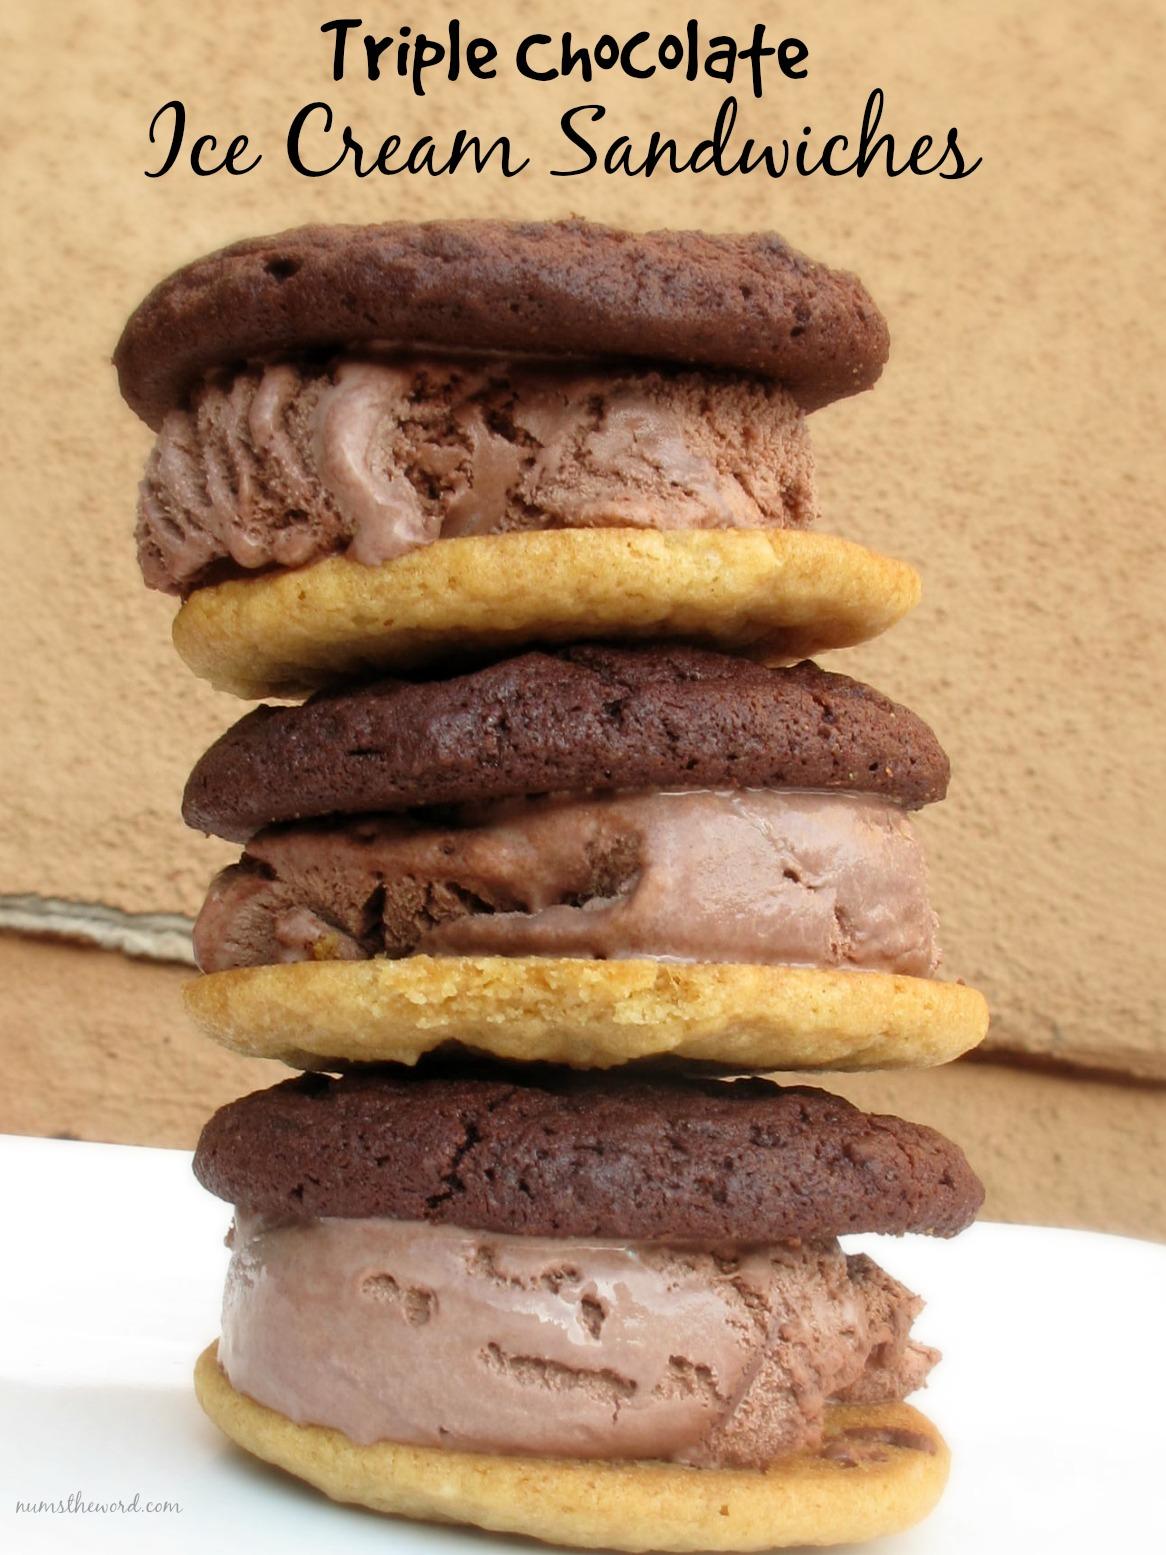 Triple Chocolate Ice Cream Sandwiches